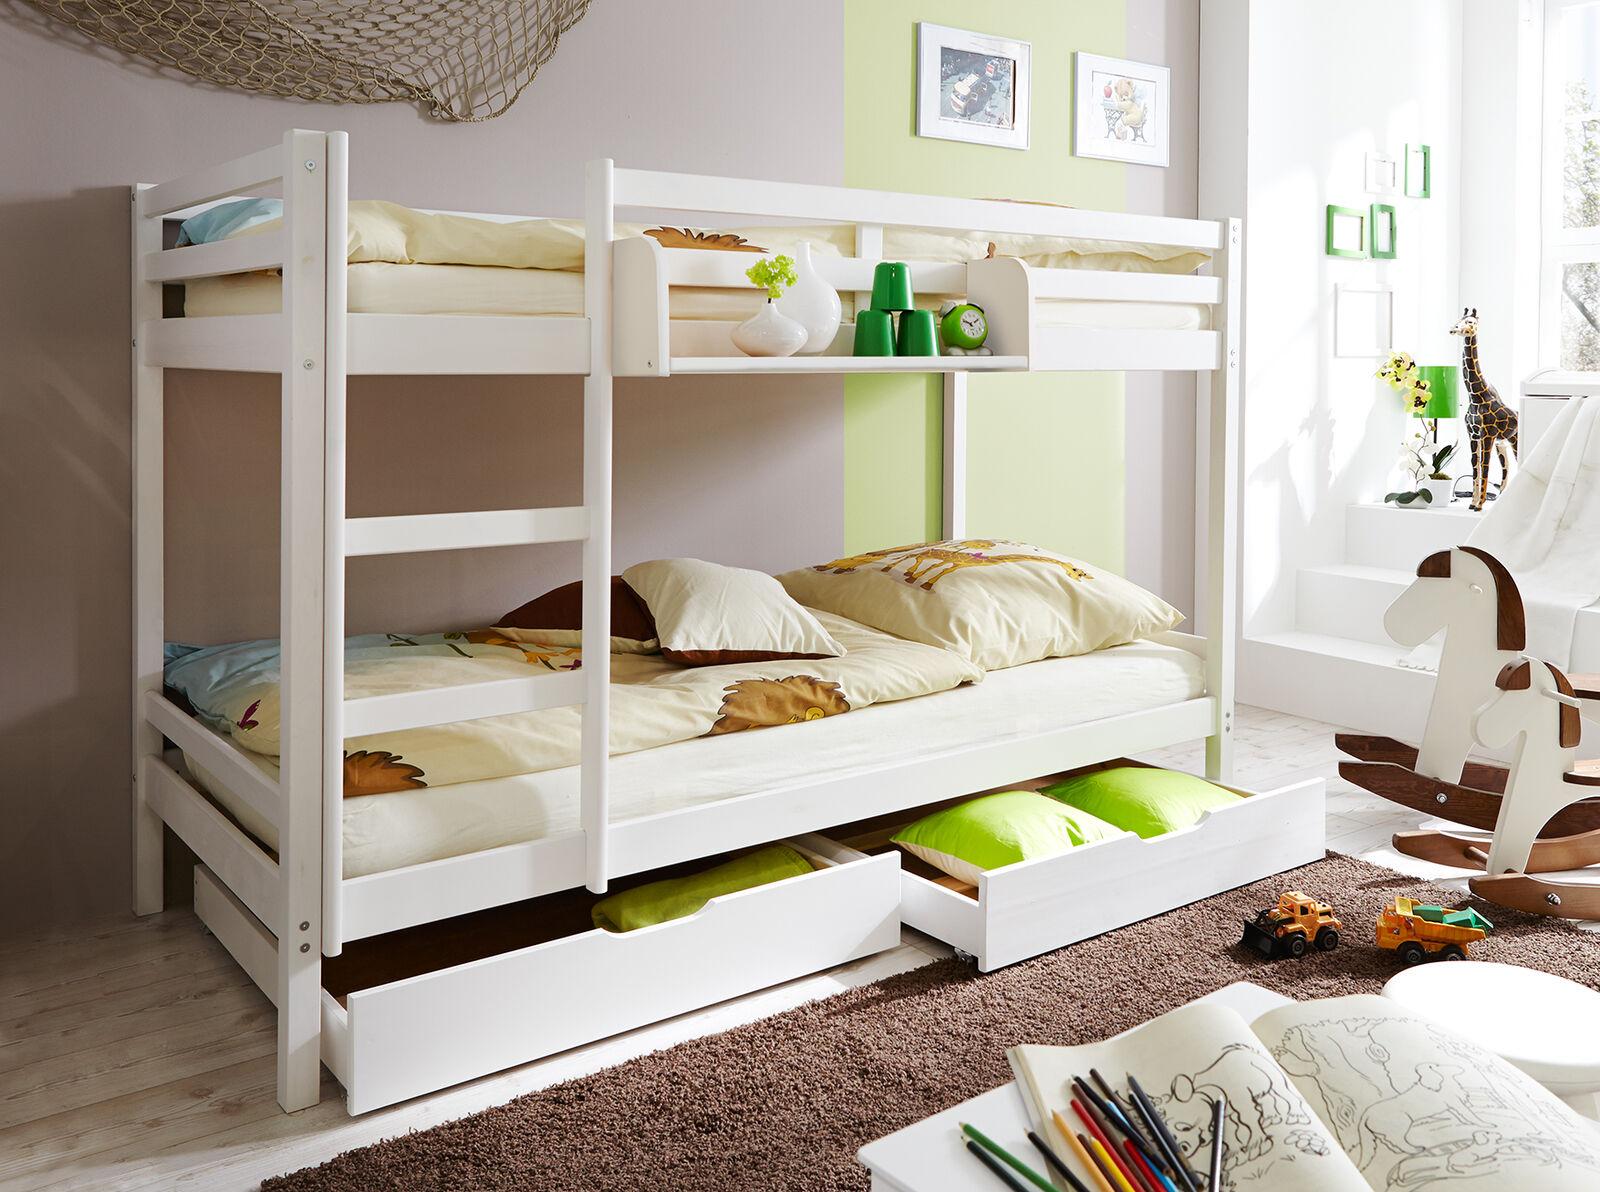 Etagenbett Günstig : Etagenbetten günstig knorrtoys zubehör drinnen etagenbett royale